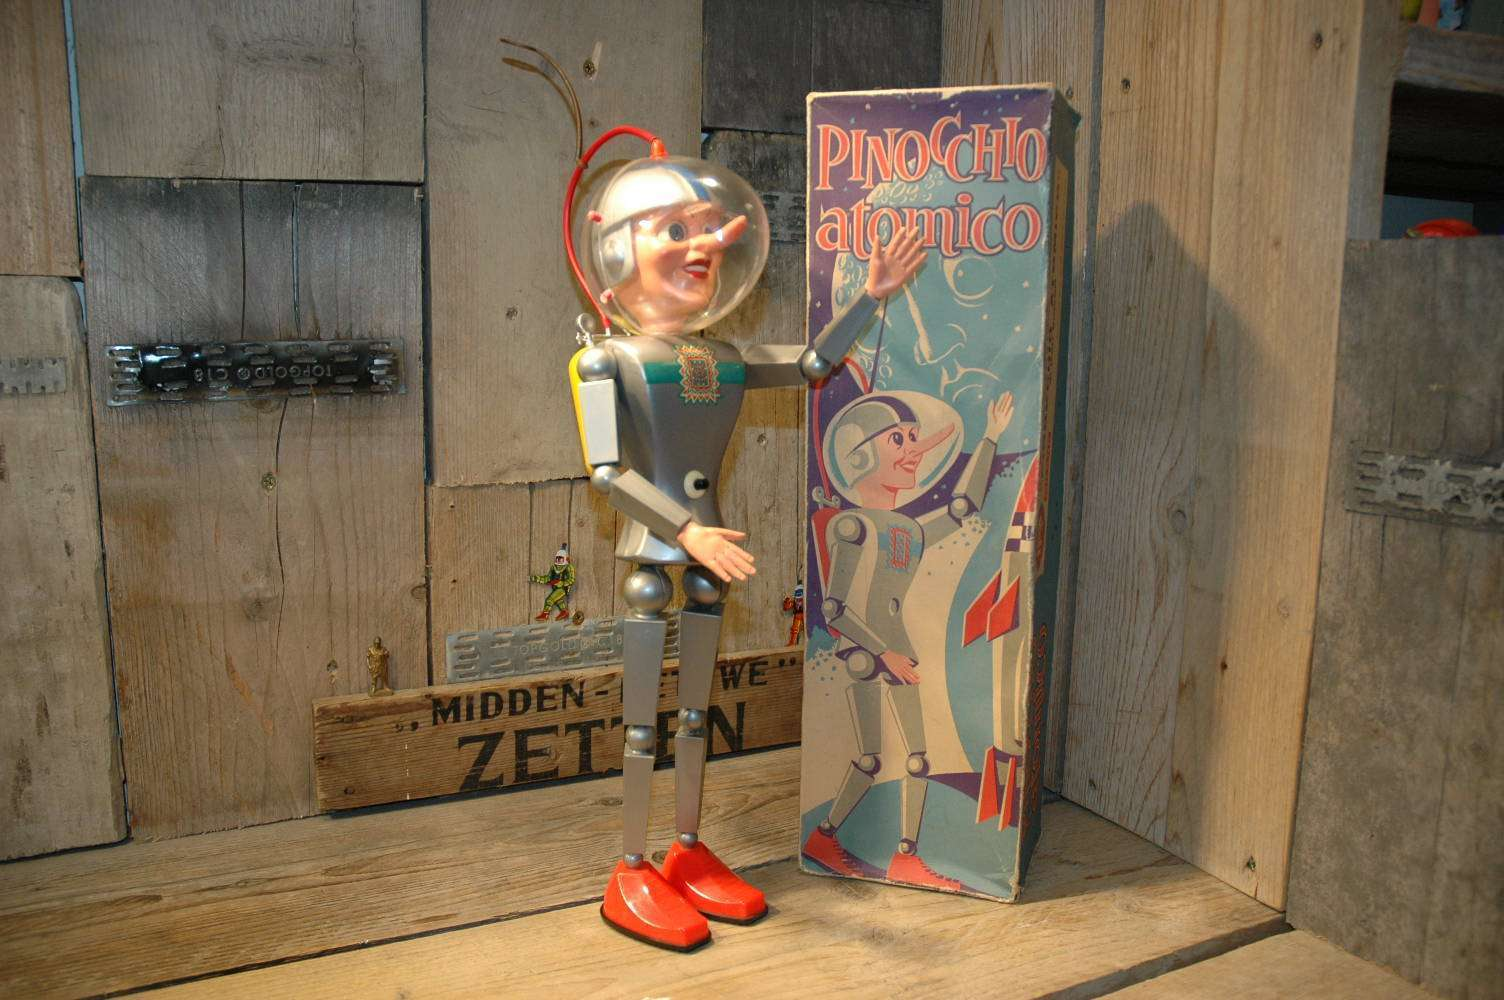 Italy Milano Vietata - Pinocchio Atomico by Dan Voidod